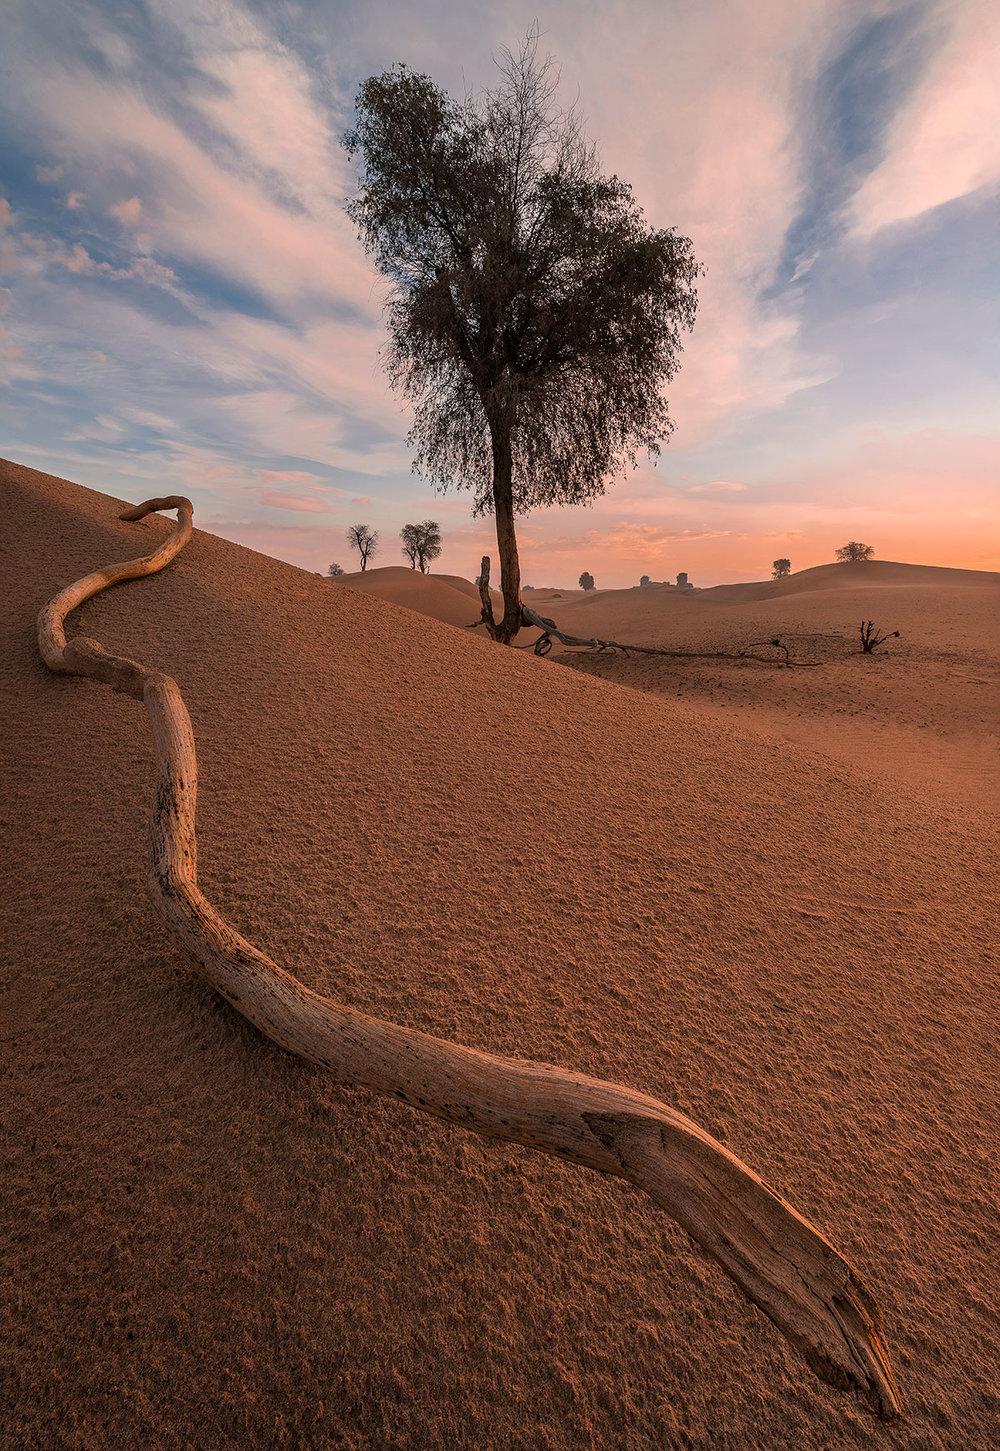 Tree at the Dubai desert